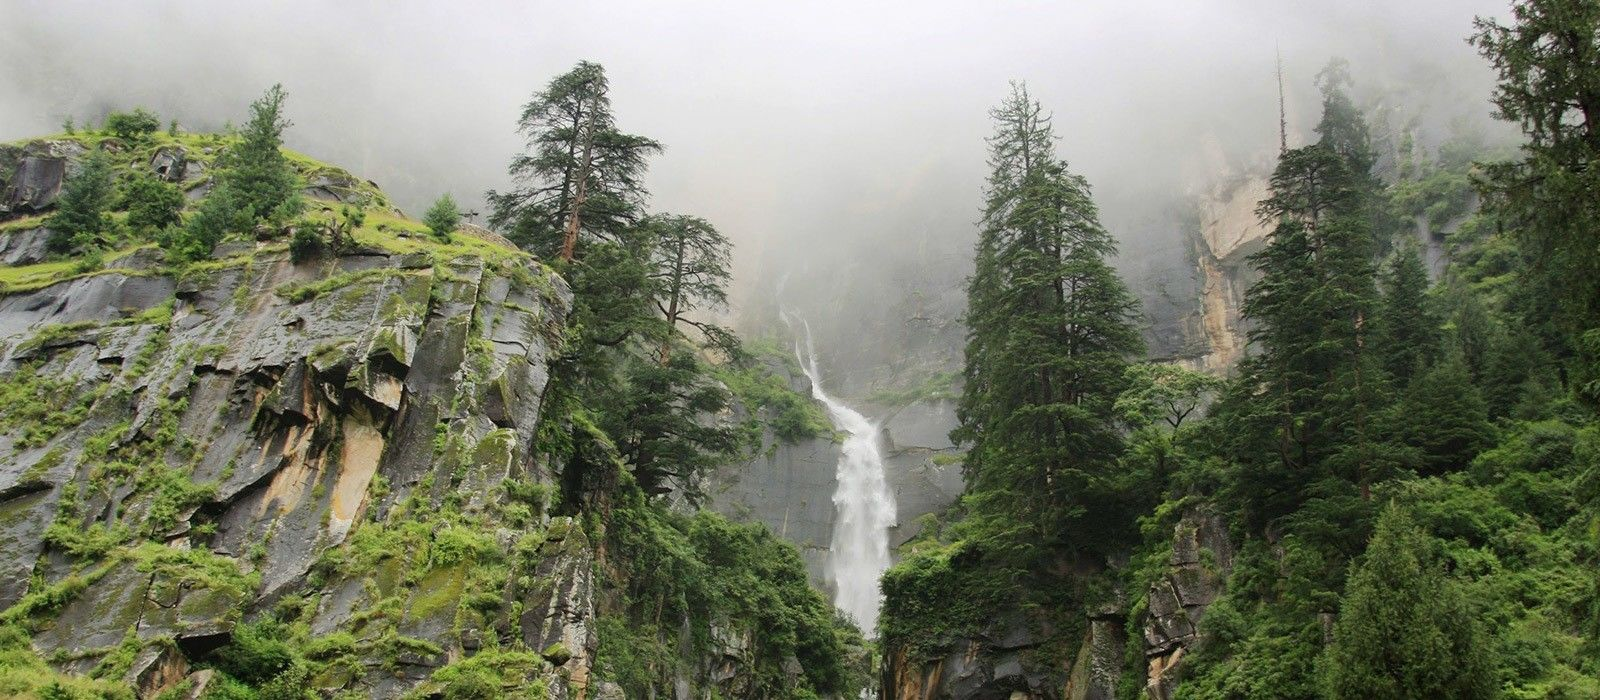 Darjeeling: Teegenuss & Berge Urlaub 5